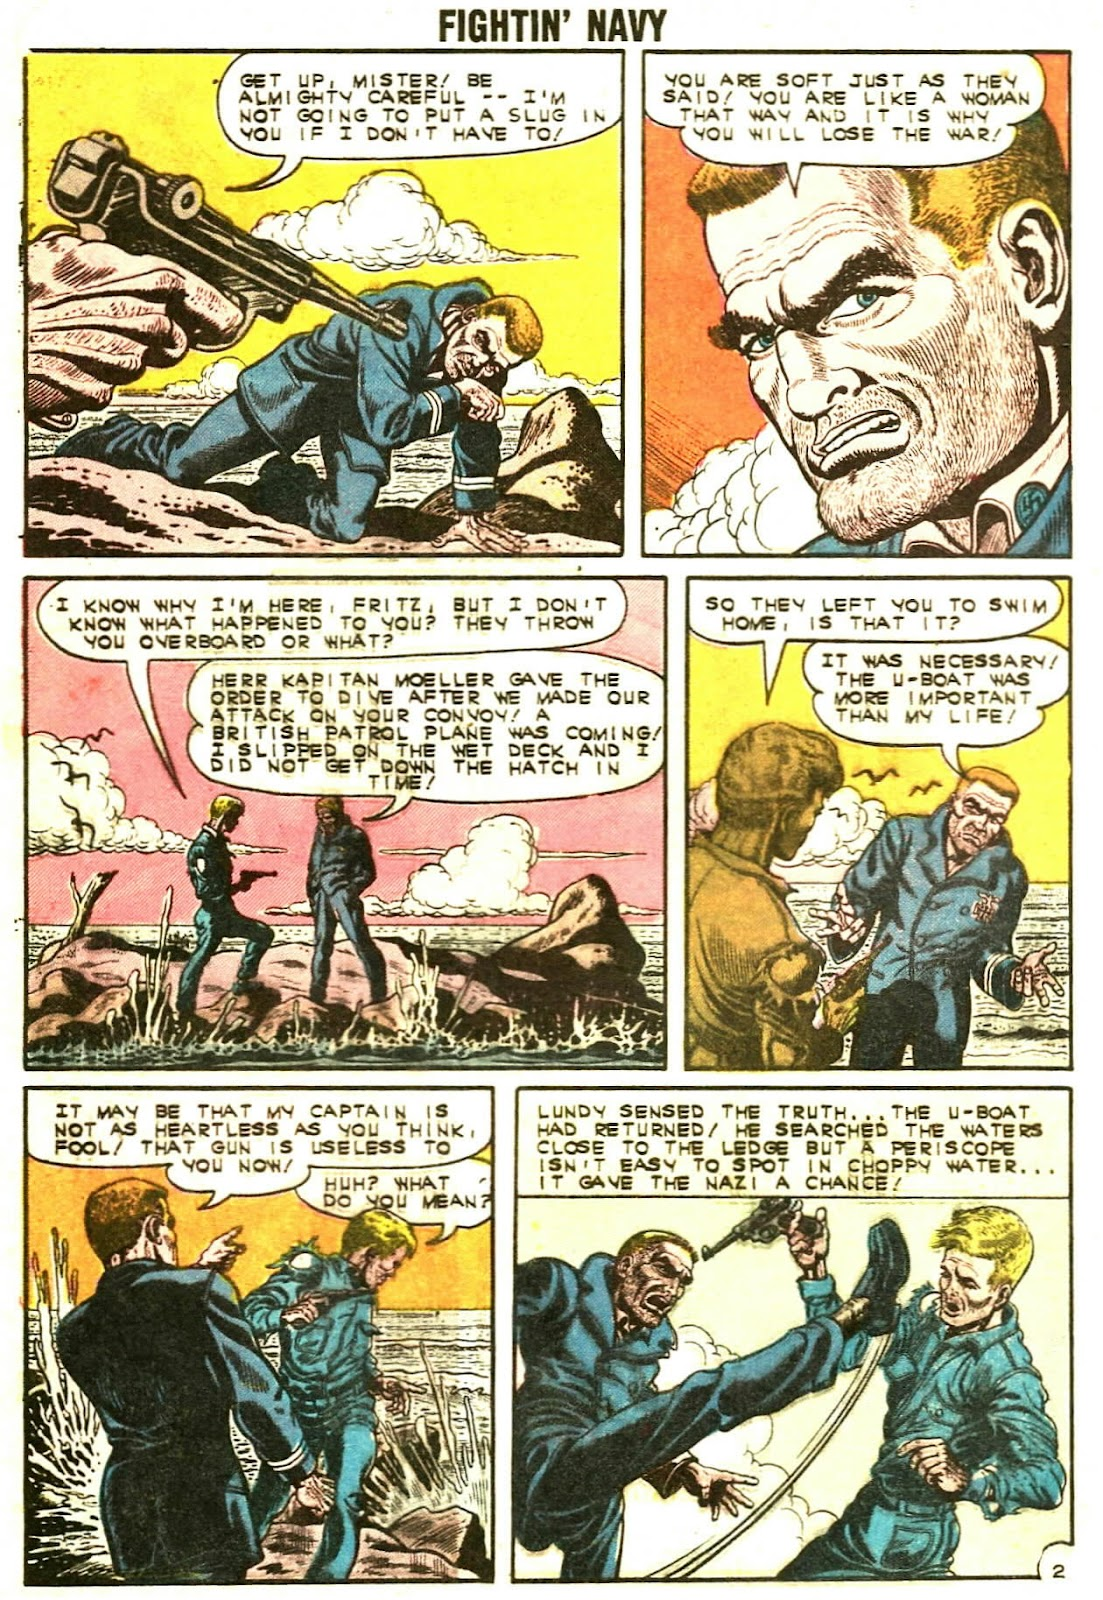 Read online Fightin' Navy comic -  Issue #107 - 4